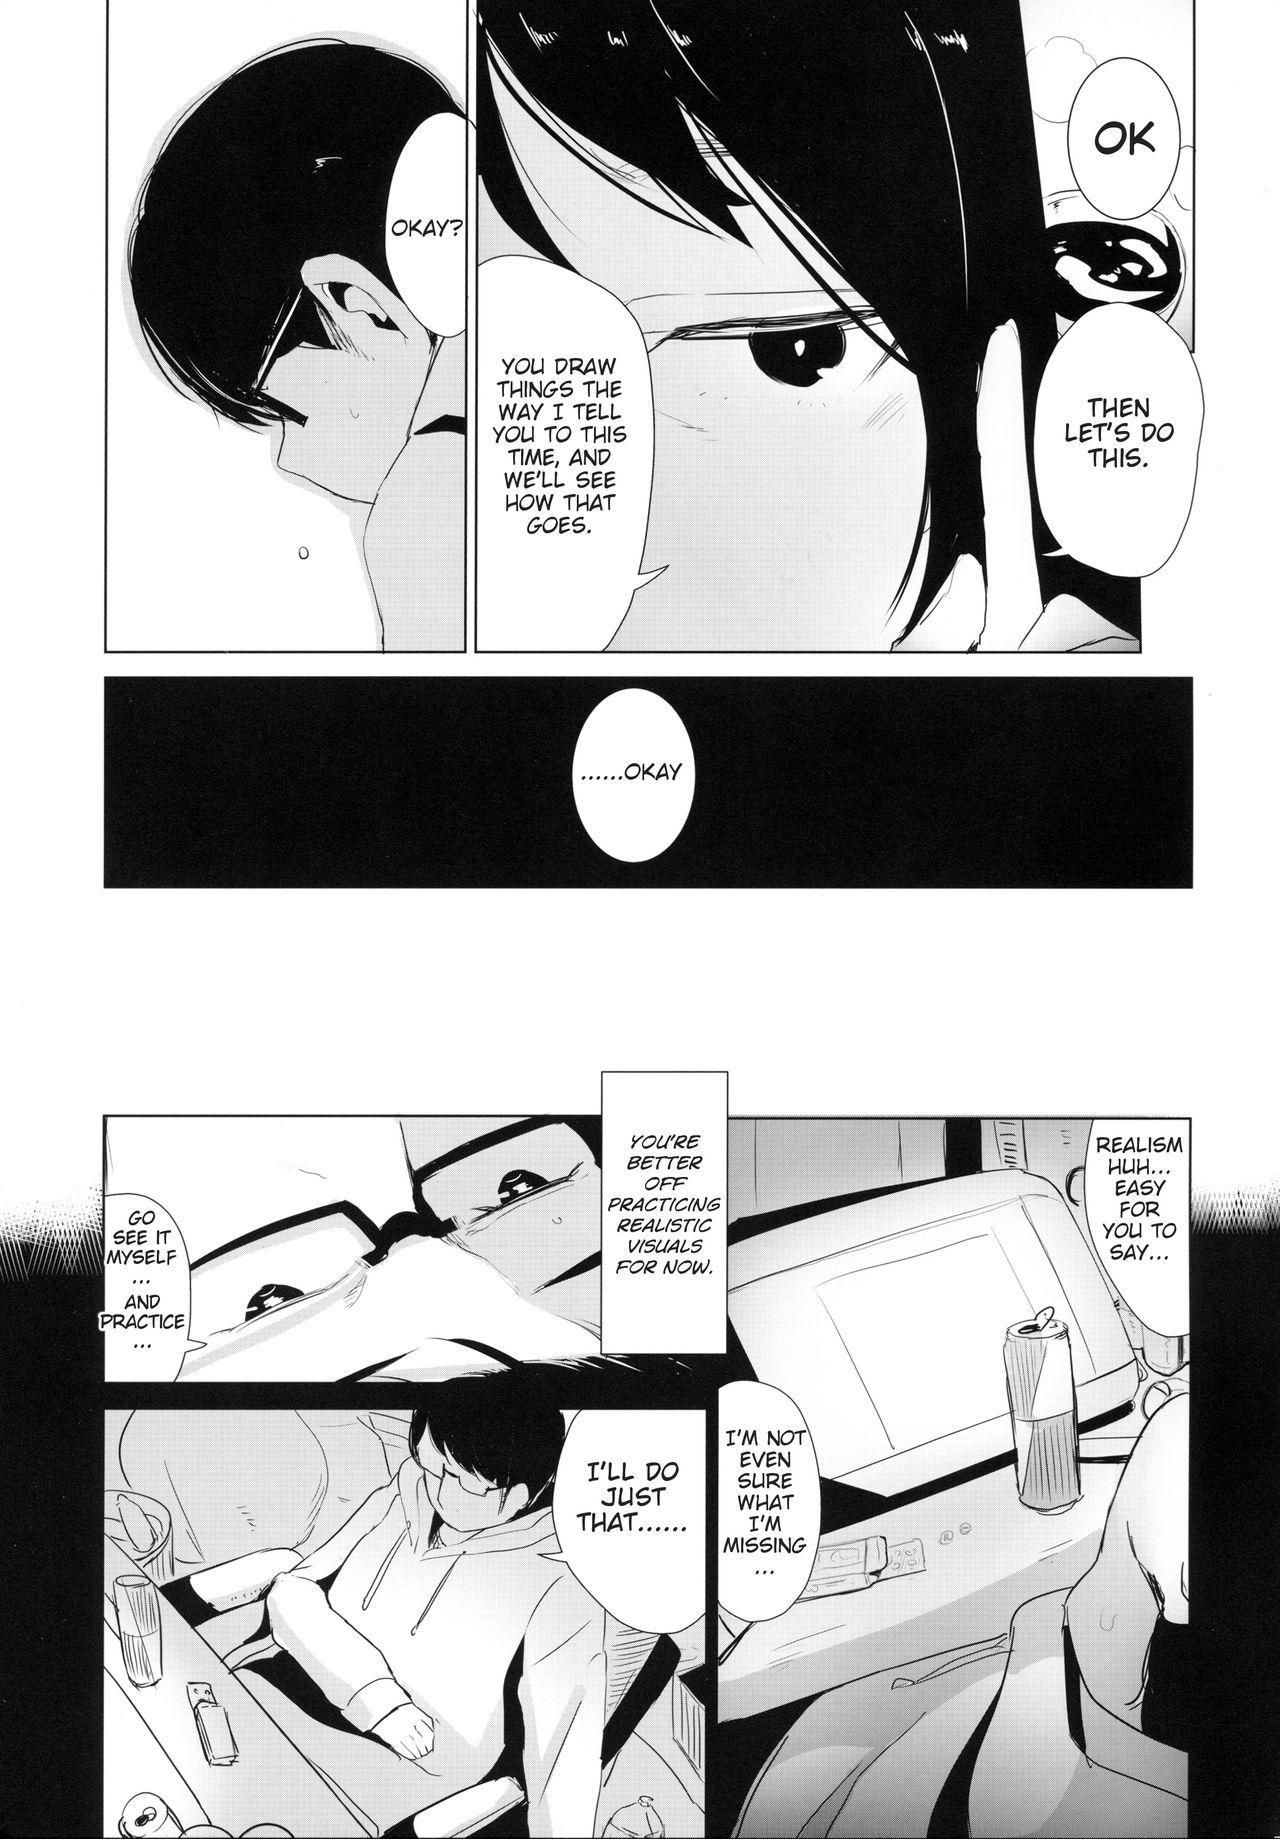 Rachirare Shoujo wa, Manga no Naka de __. Koharu Hen | The Kidnapped Girl in the Manga... Chiharu Chapter 3